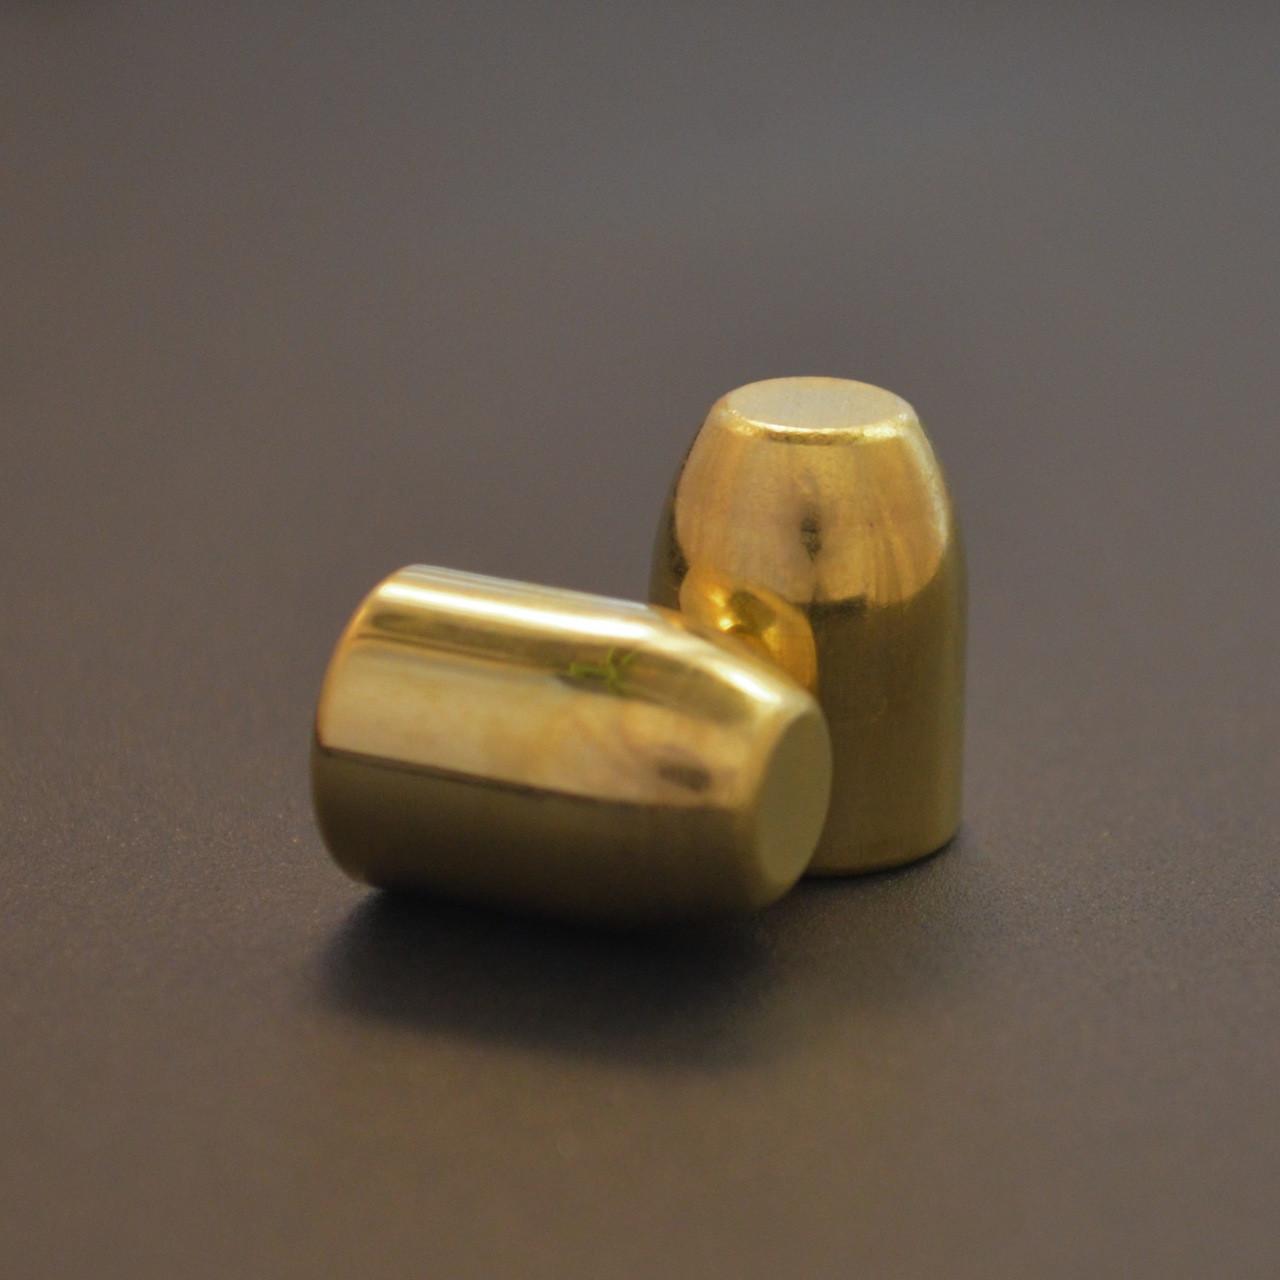 10mm/.40 165gr CMJ - 2,700ct CASE